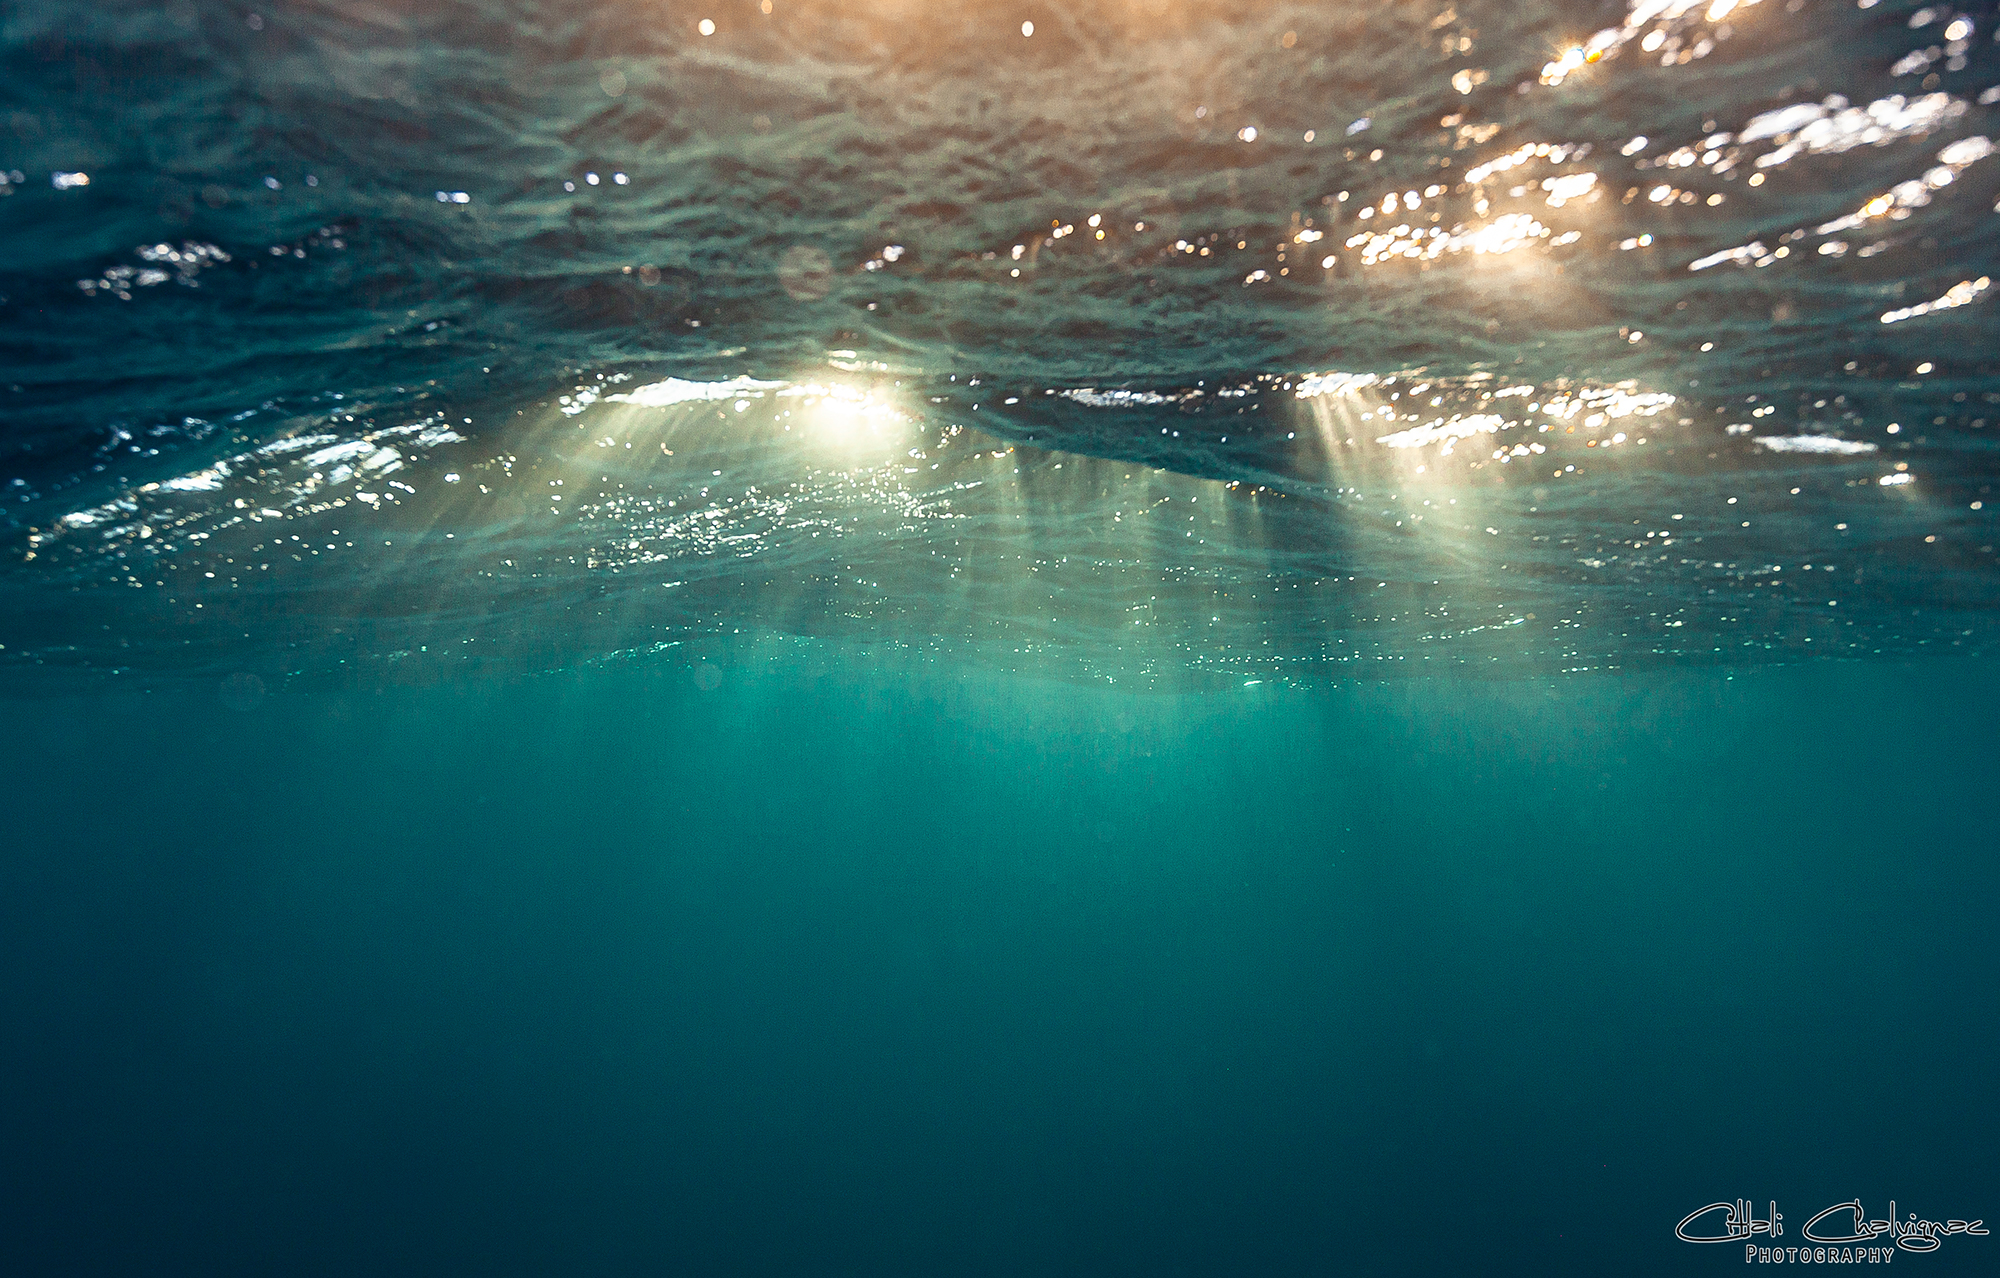 Galeria Ocean imagen 1 Citlali Chalvignac